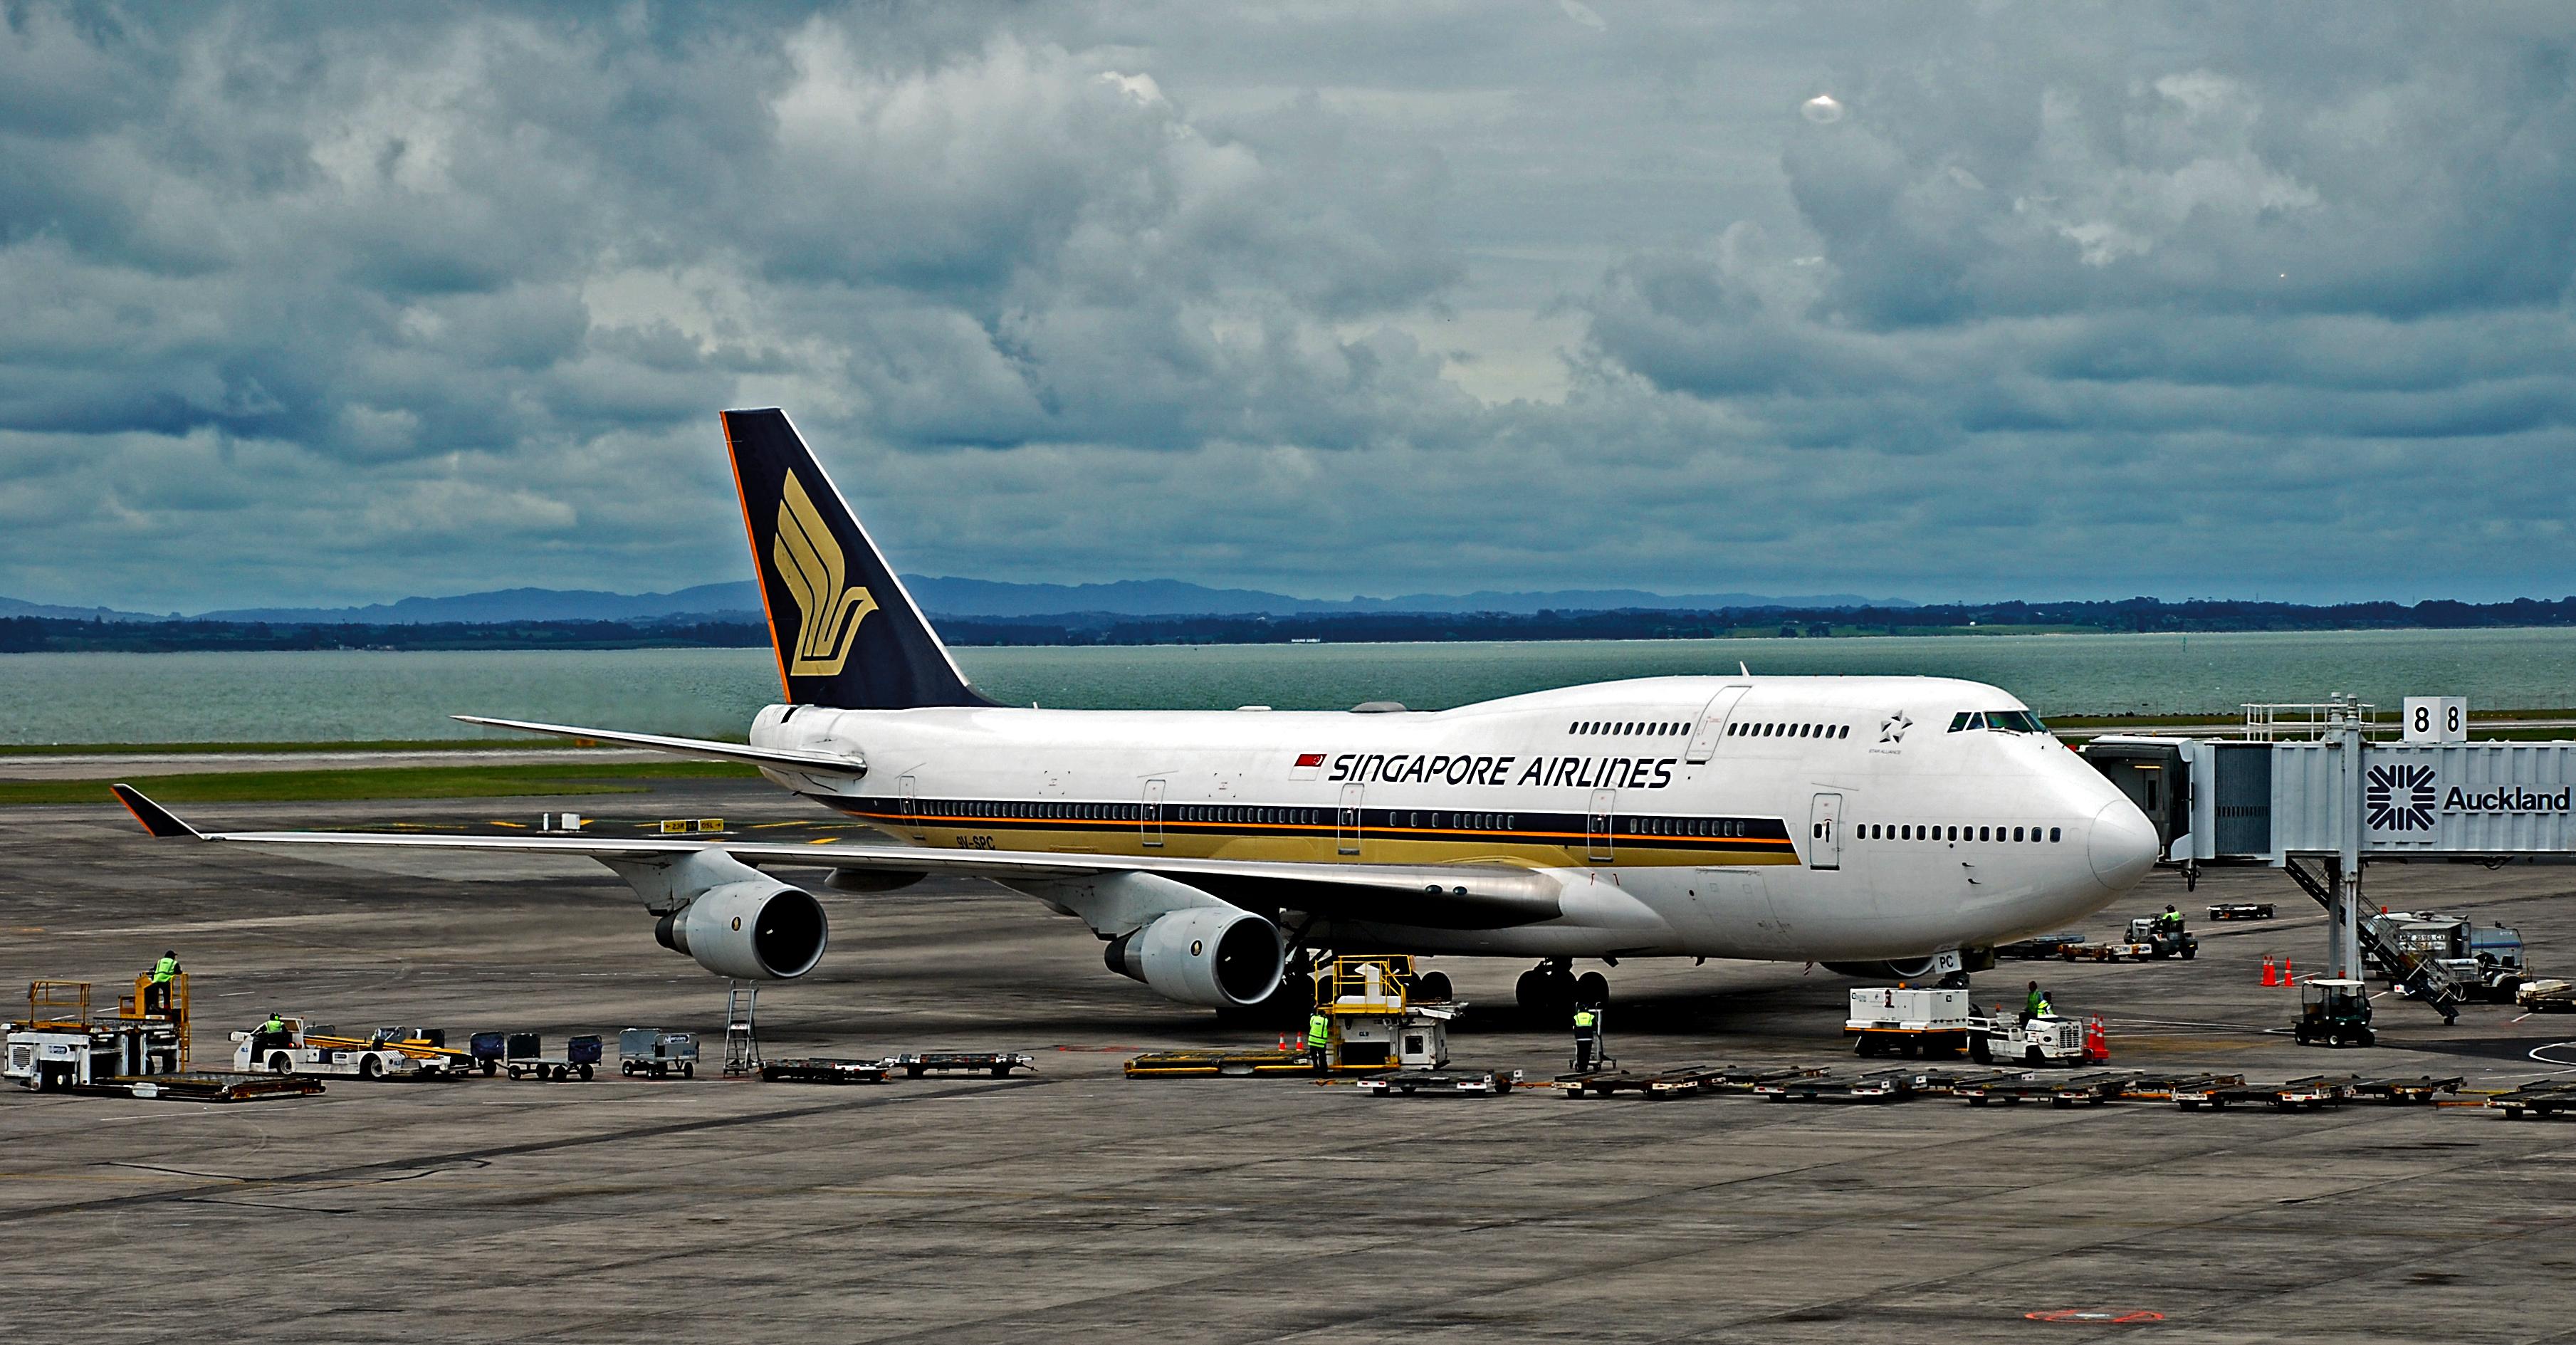 Singapore Airlines | SQ | SIA | Heathrow